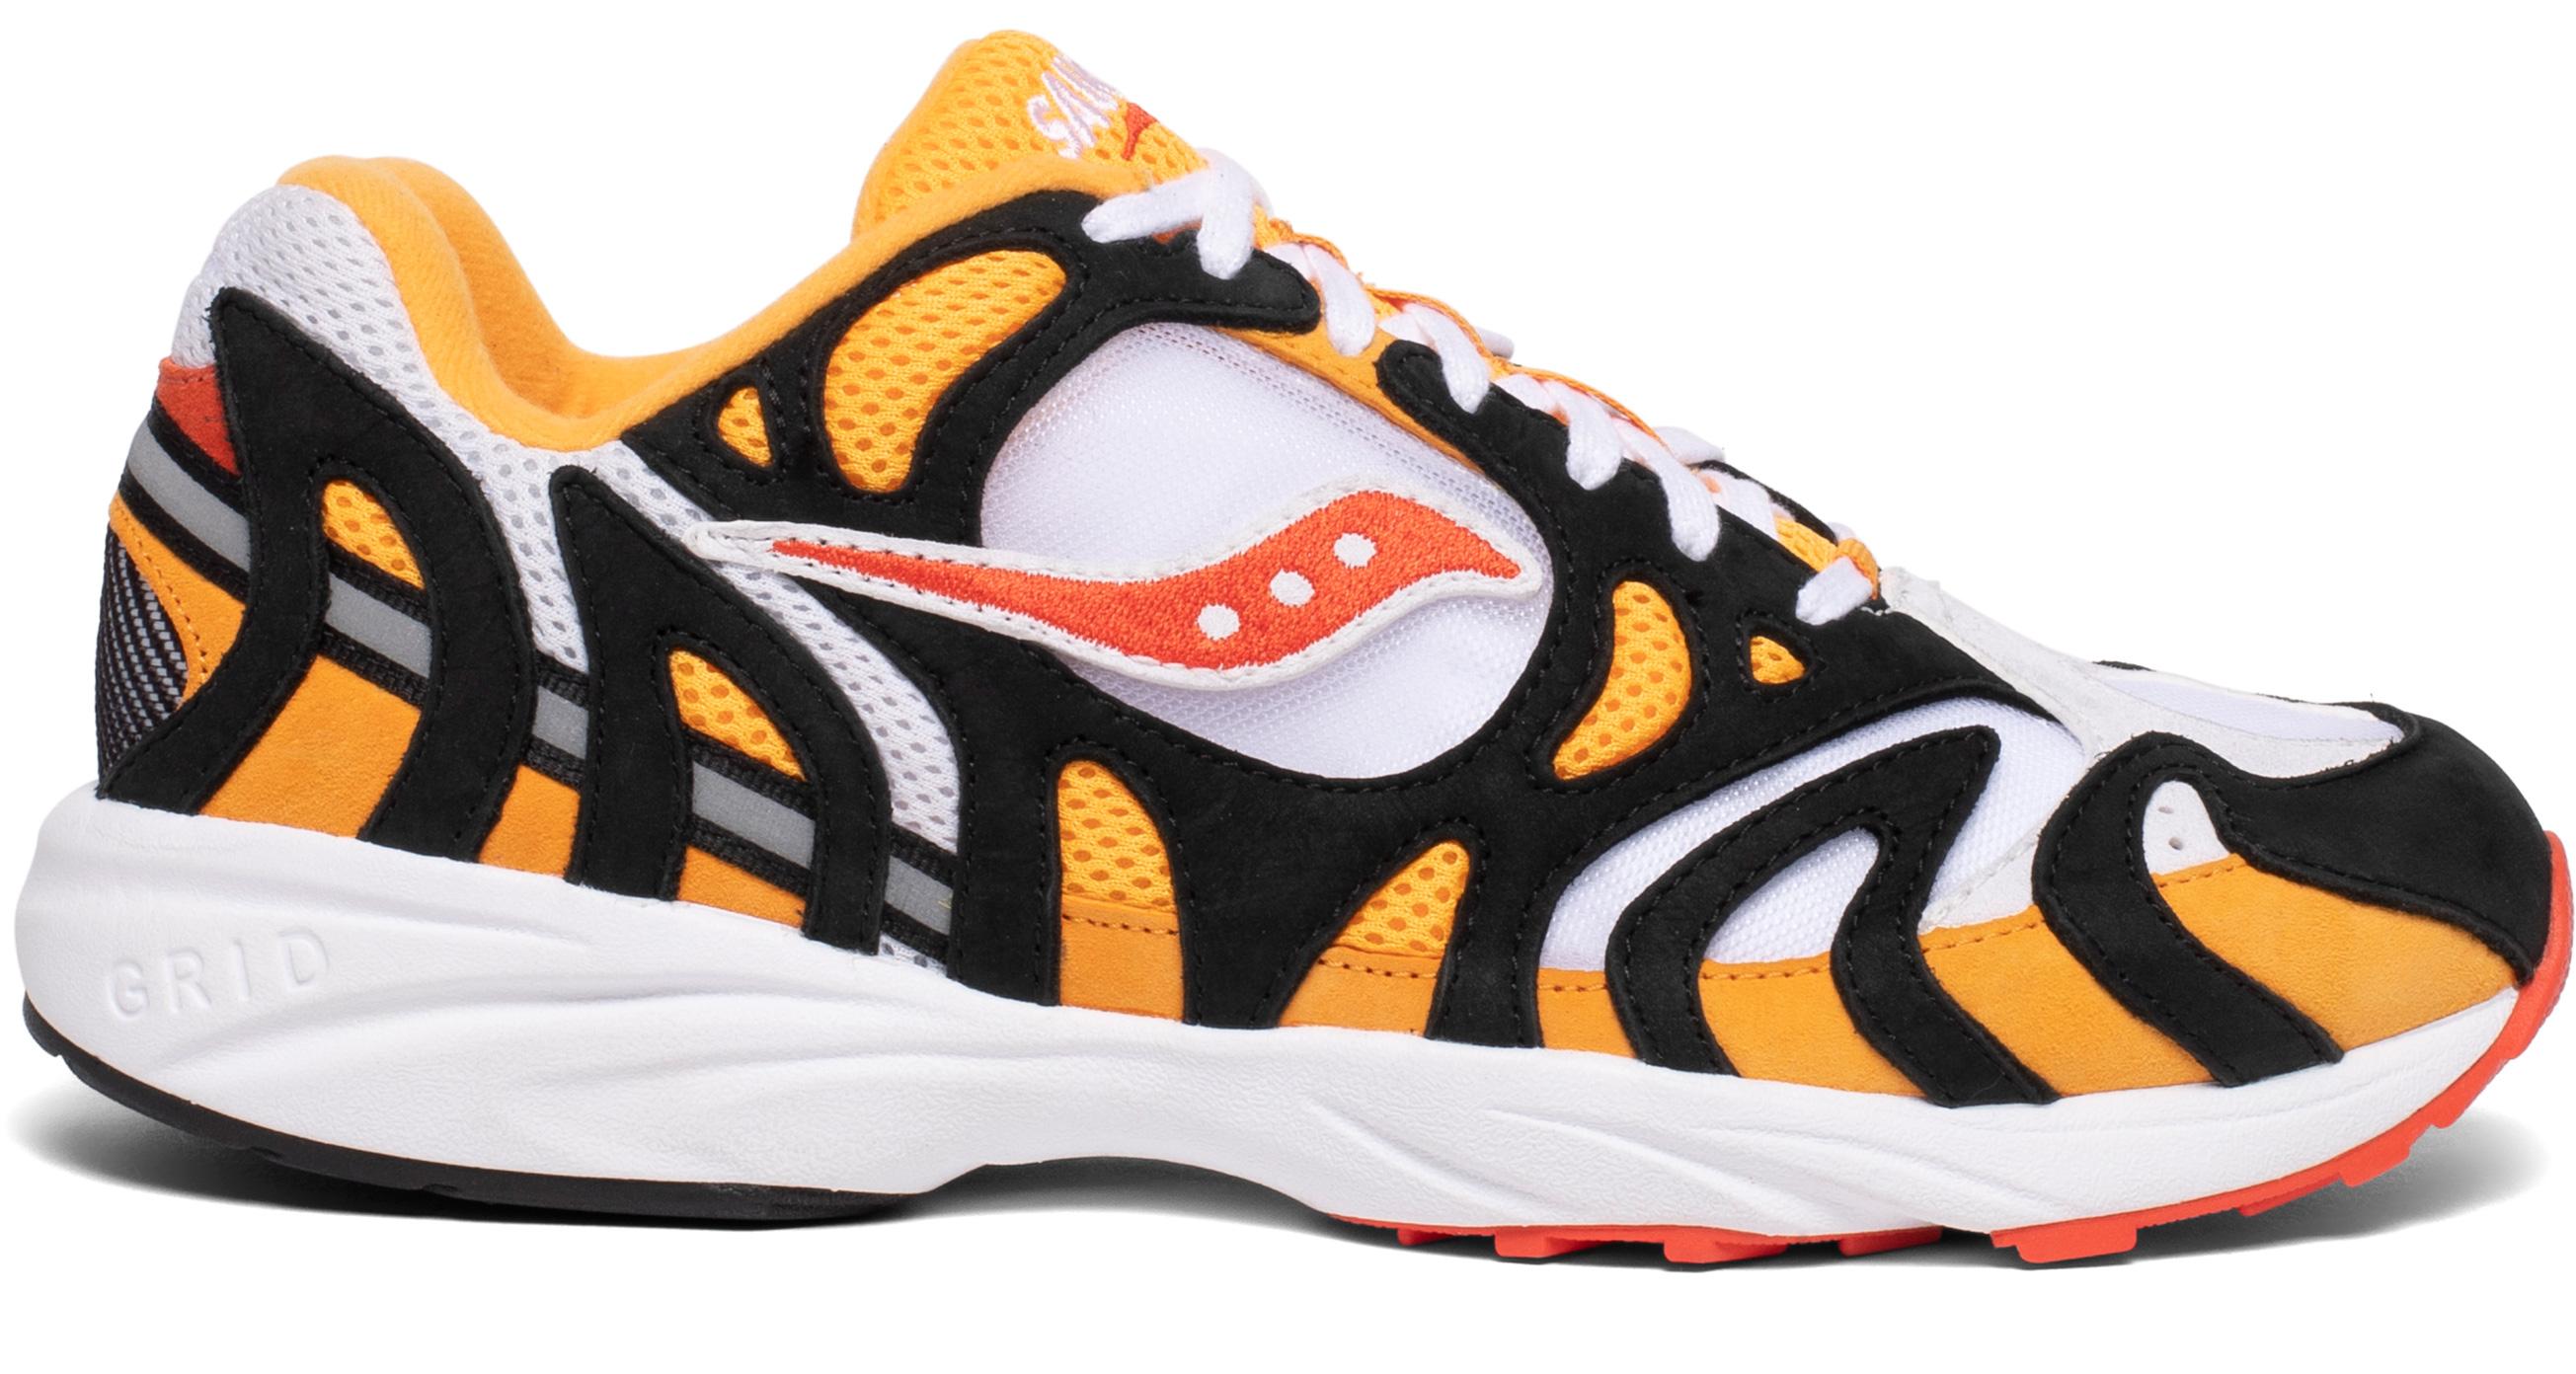 The Grid Azura 2000 shoe.